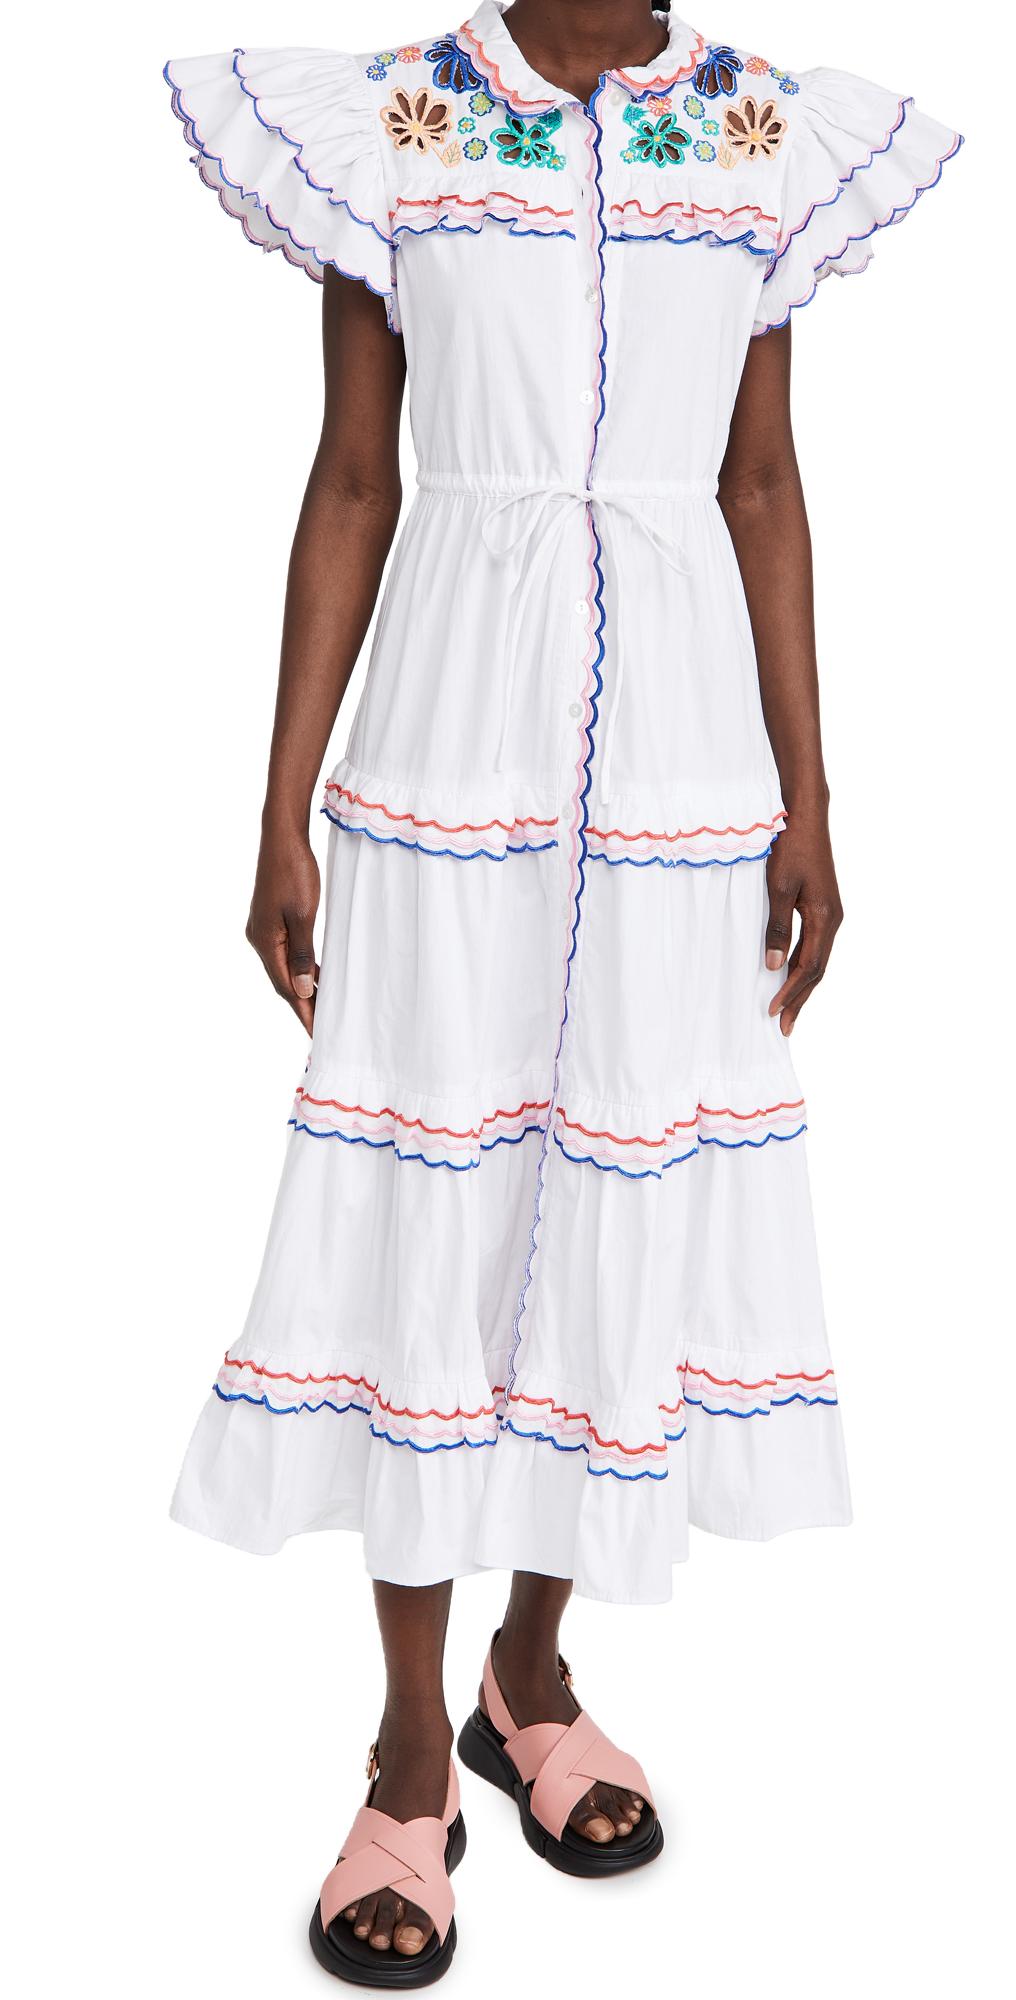 Silene Dress